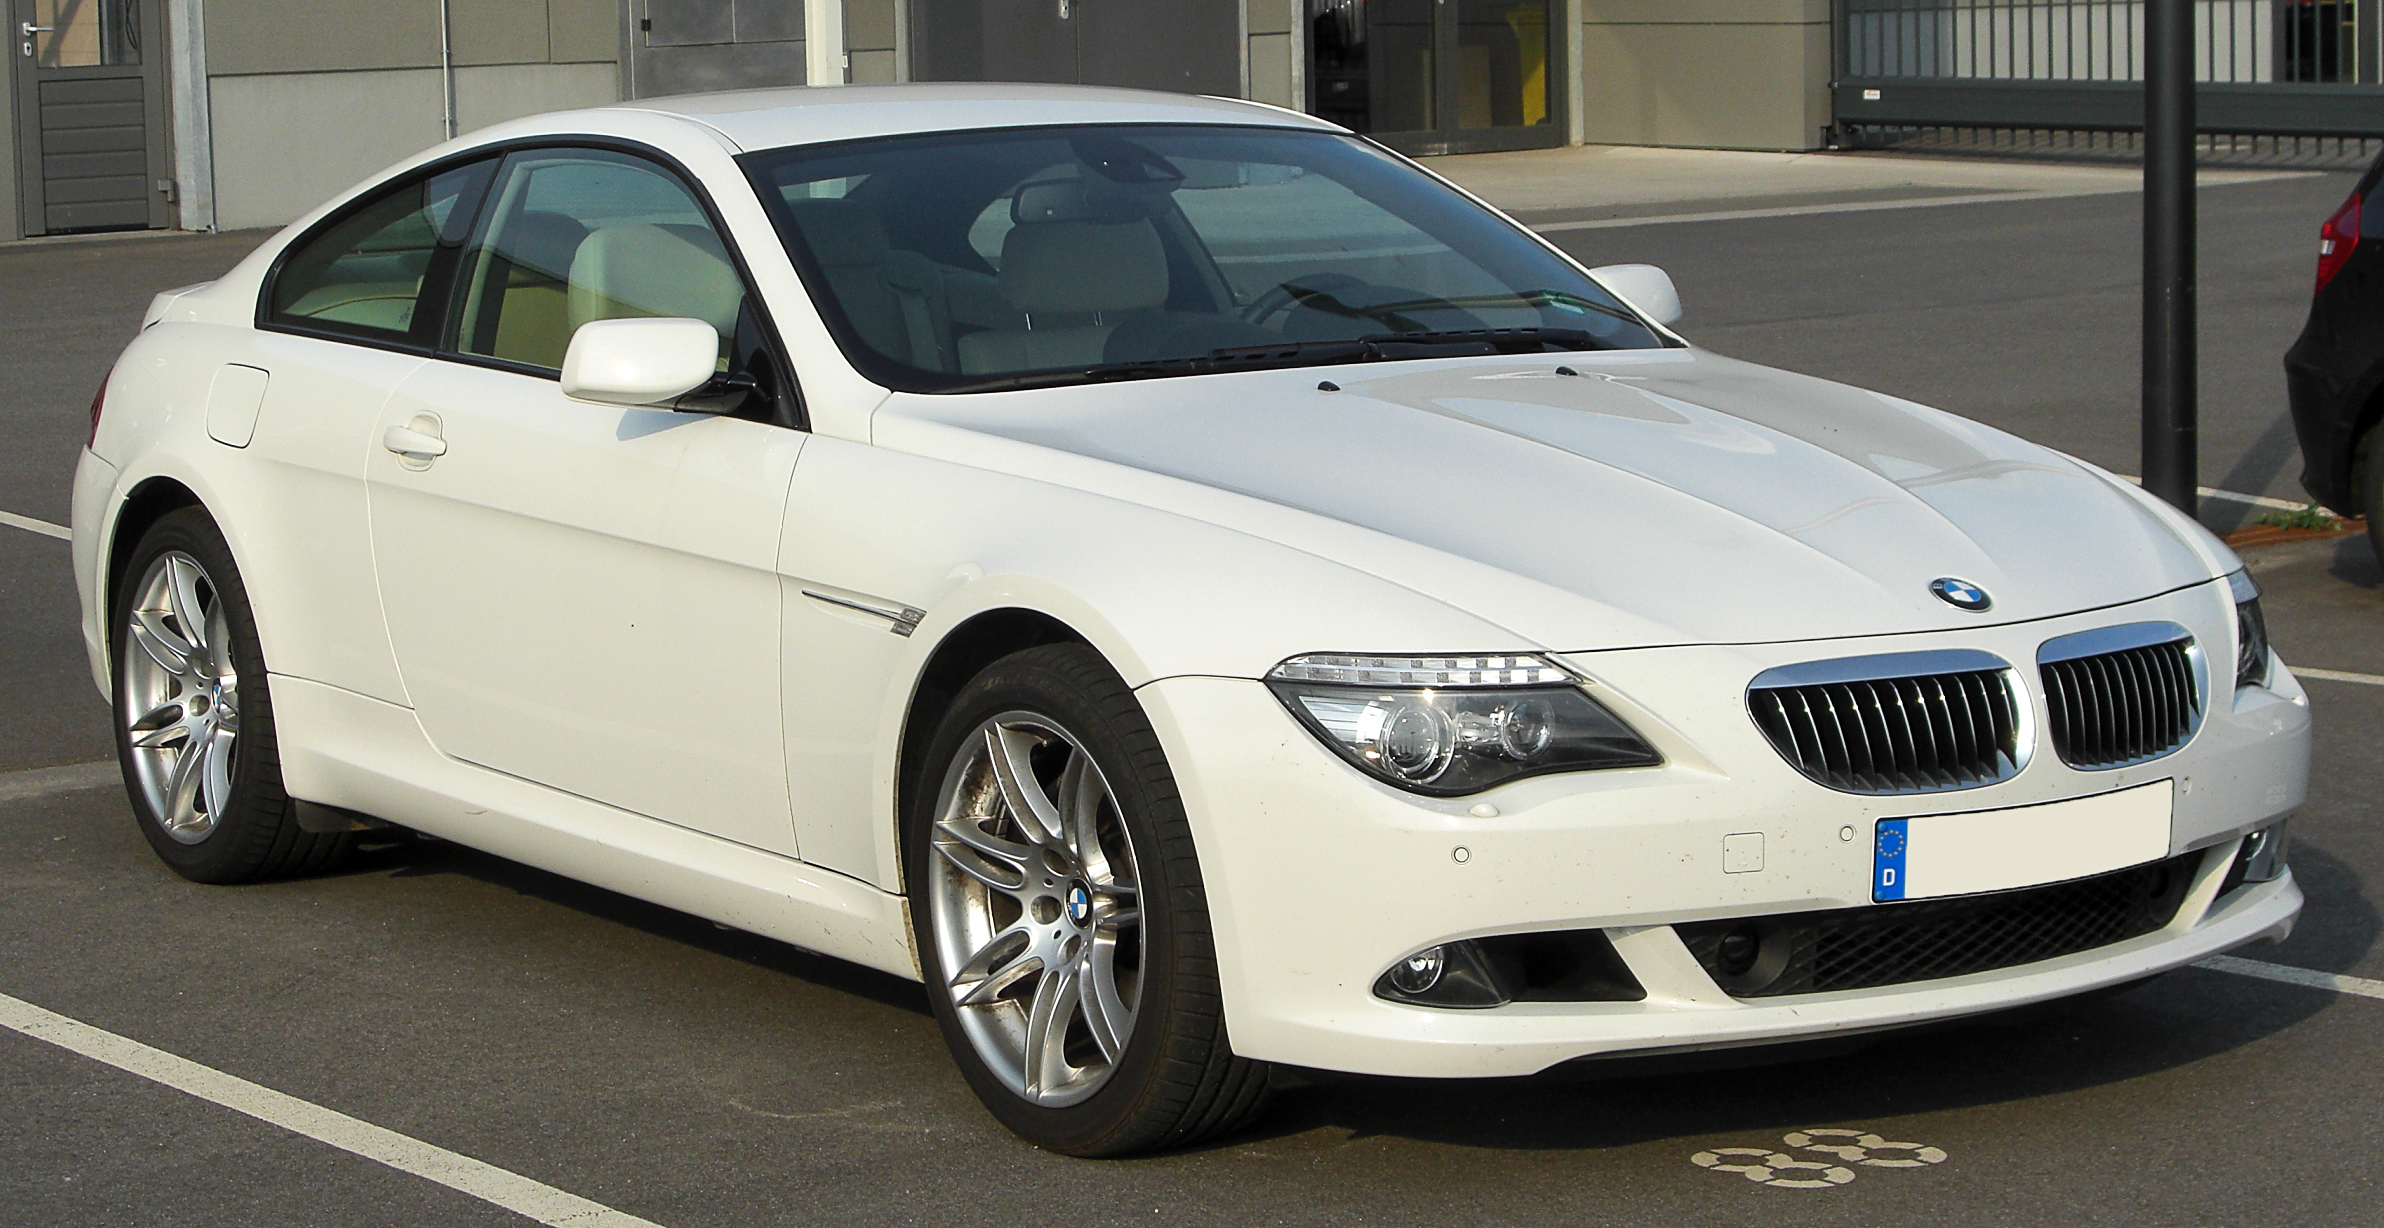 File:BMW 6er Coupé (E63) Facelift front 20100814.jpg - Wikimedia Commons